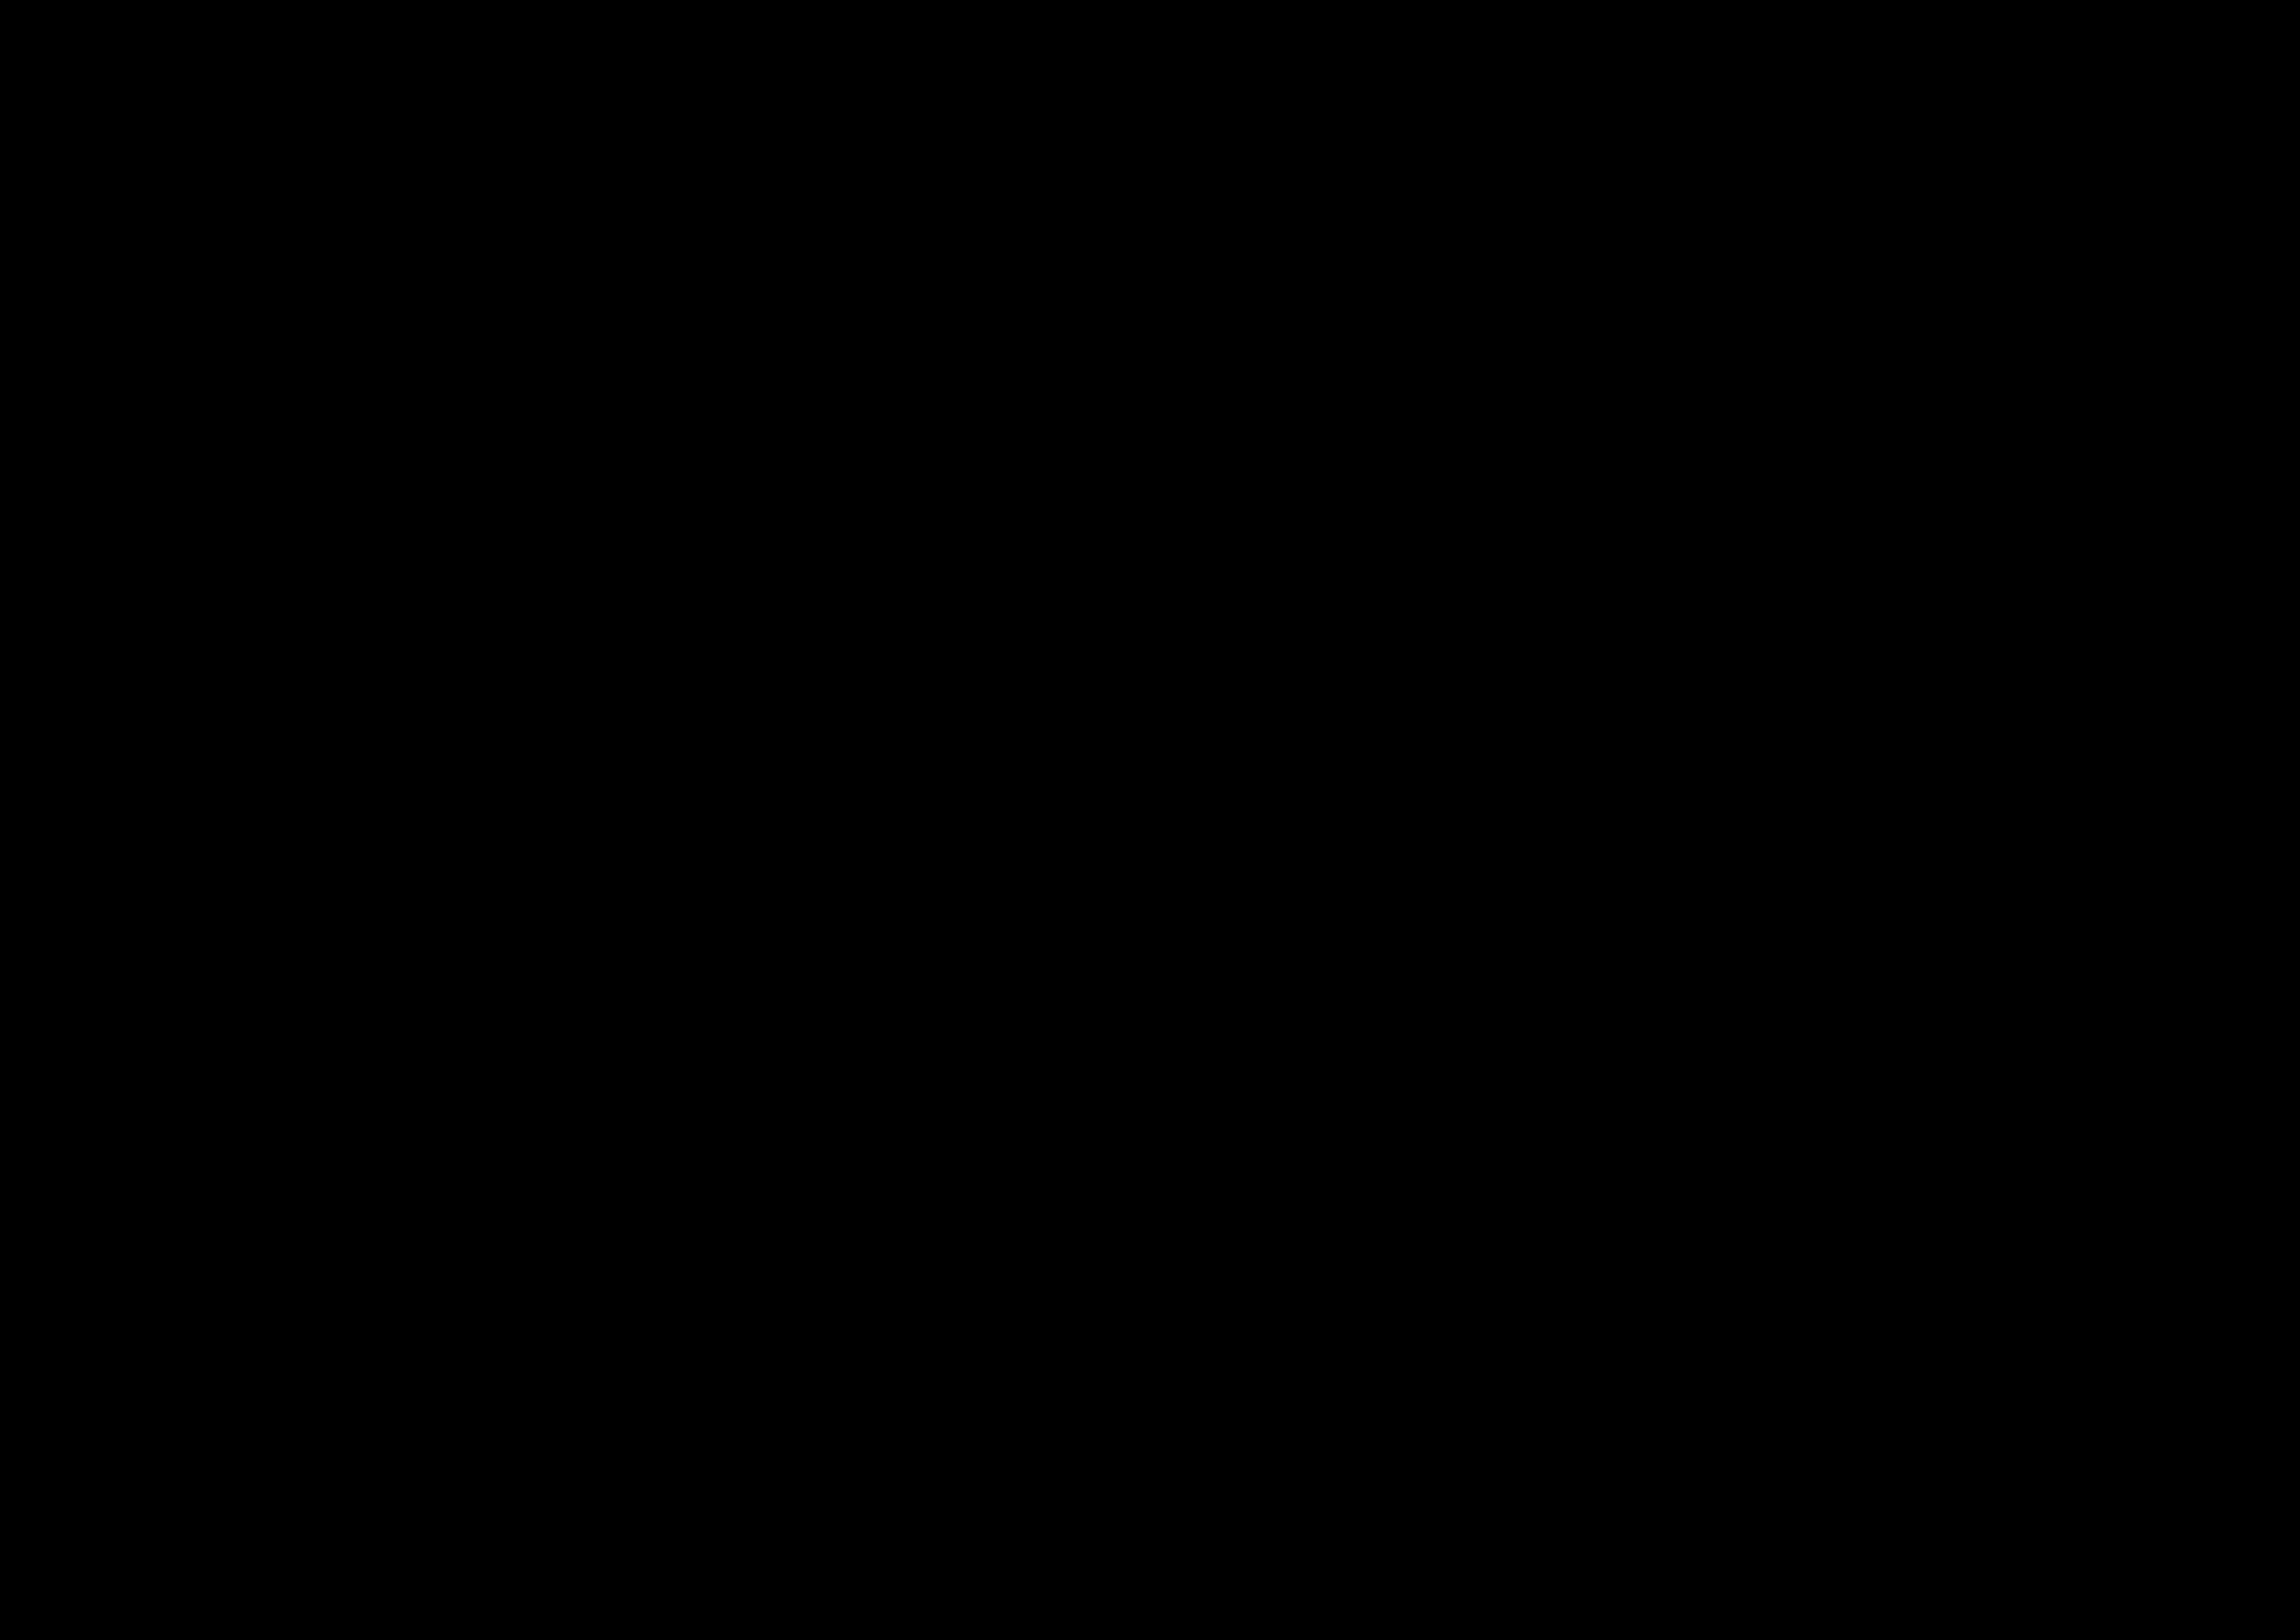 s_logo-black